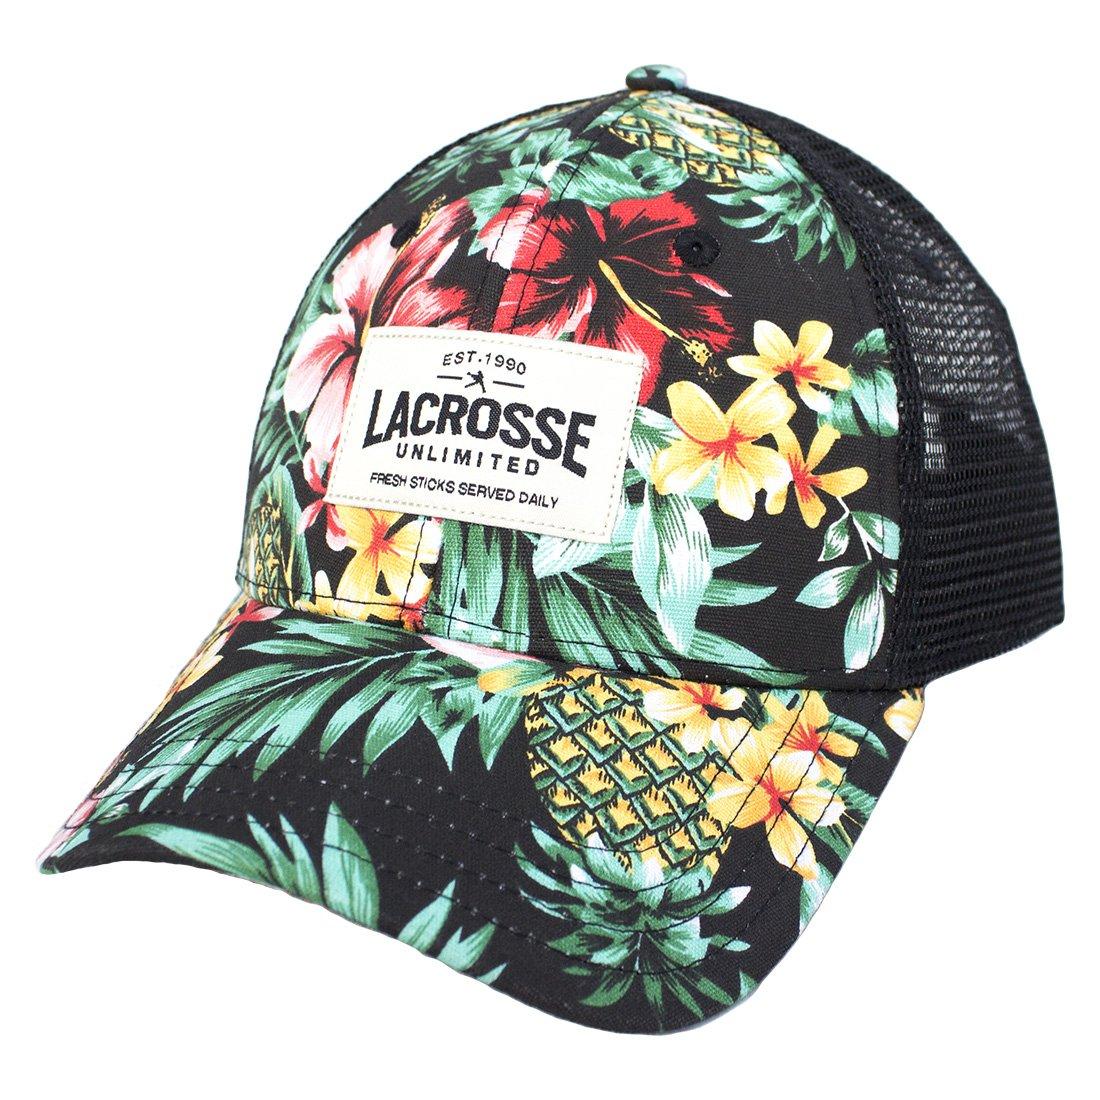 Lacrosse Unlimited Trucker Hat -Floral